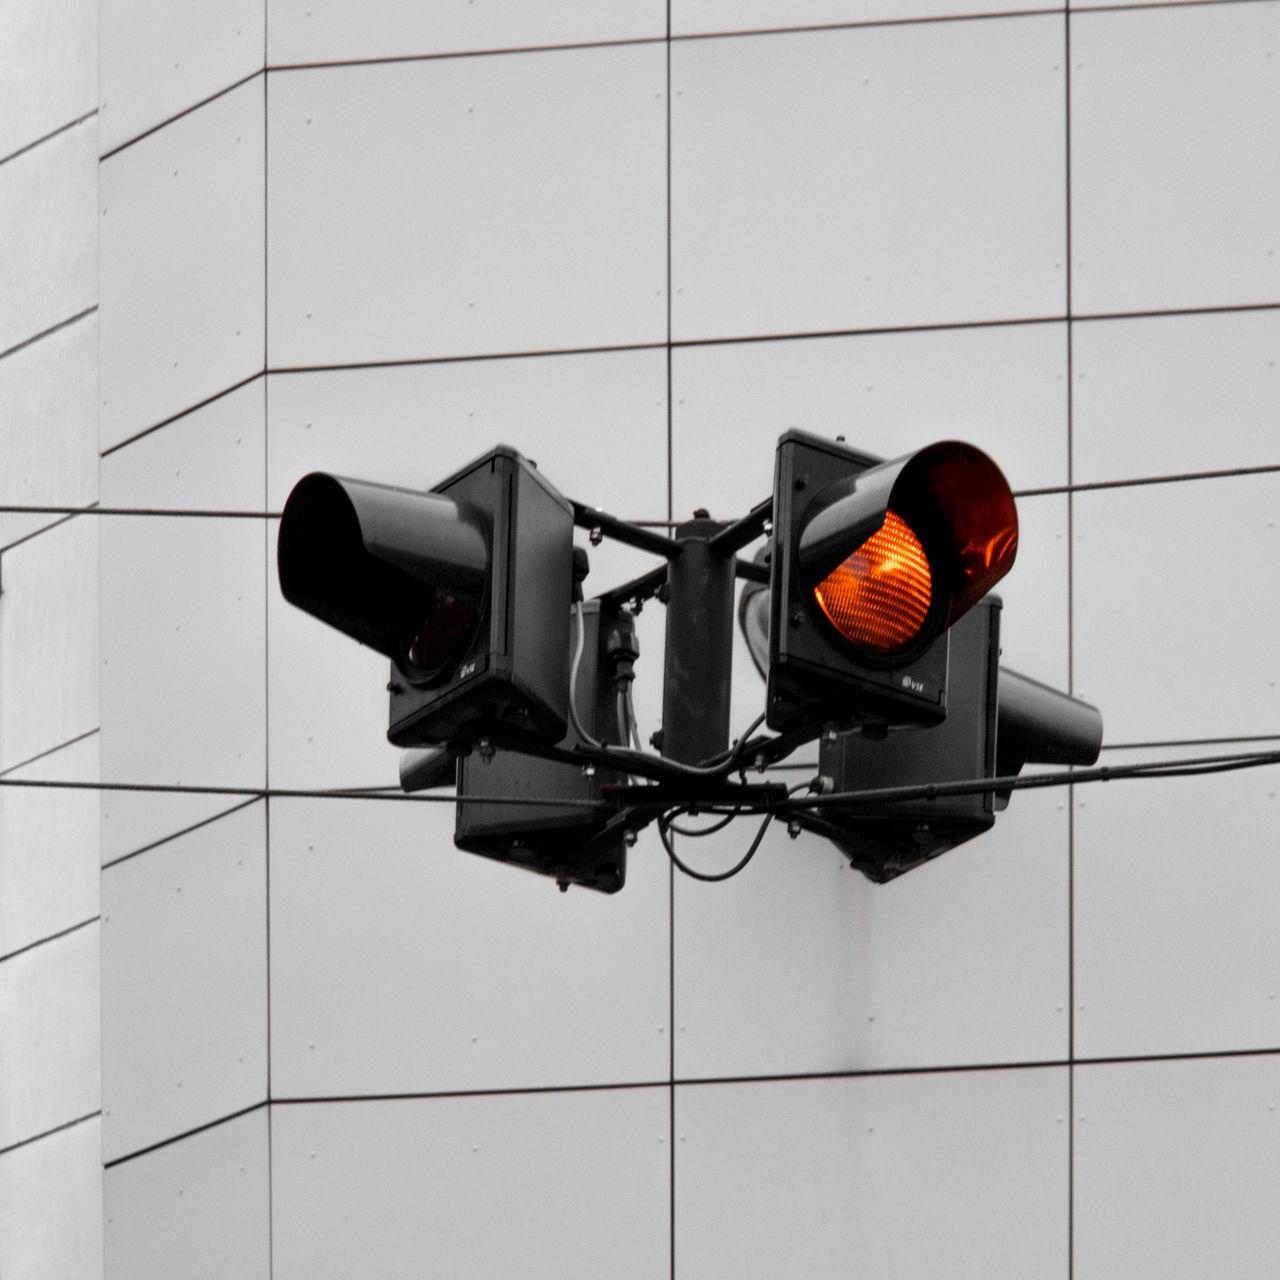 Blinkin' Orange Cityexplorer Close-up Day Illuminated No People Red Light Signal Technology Urban Geometry Urban Landscape The City Light Minimalz Art Is Everywhere Premium Collection